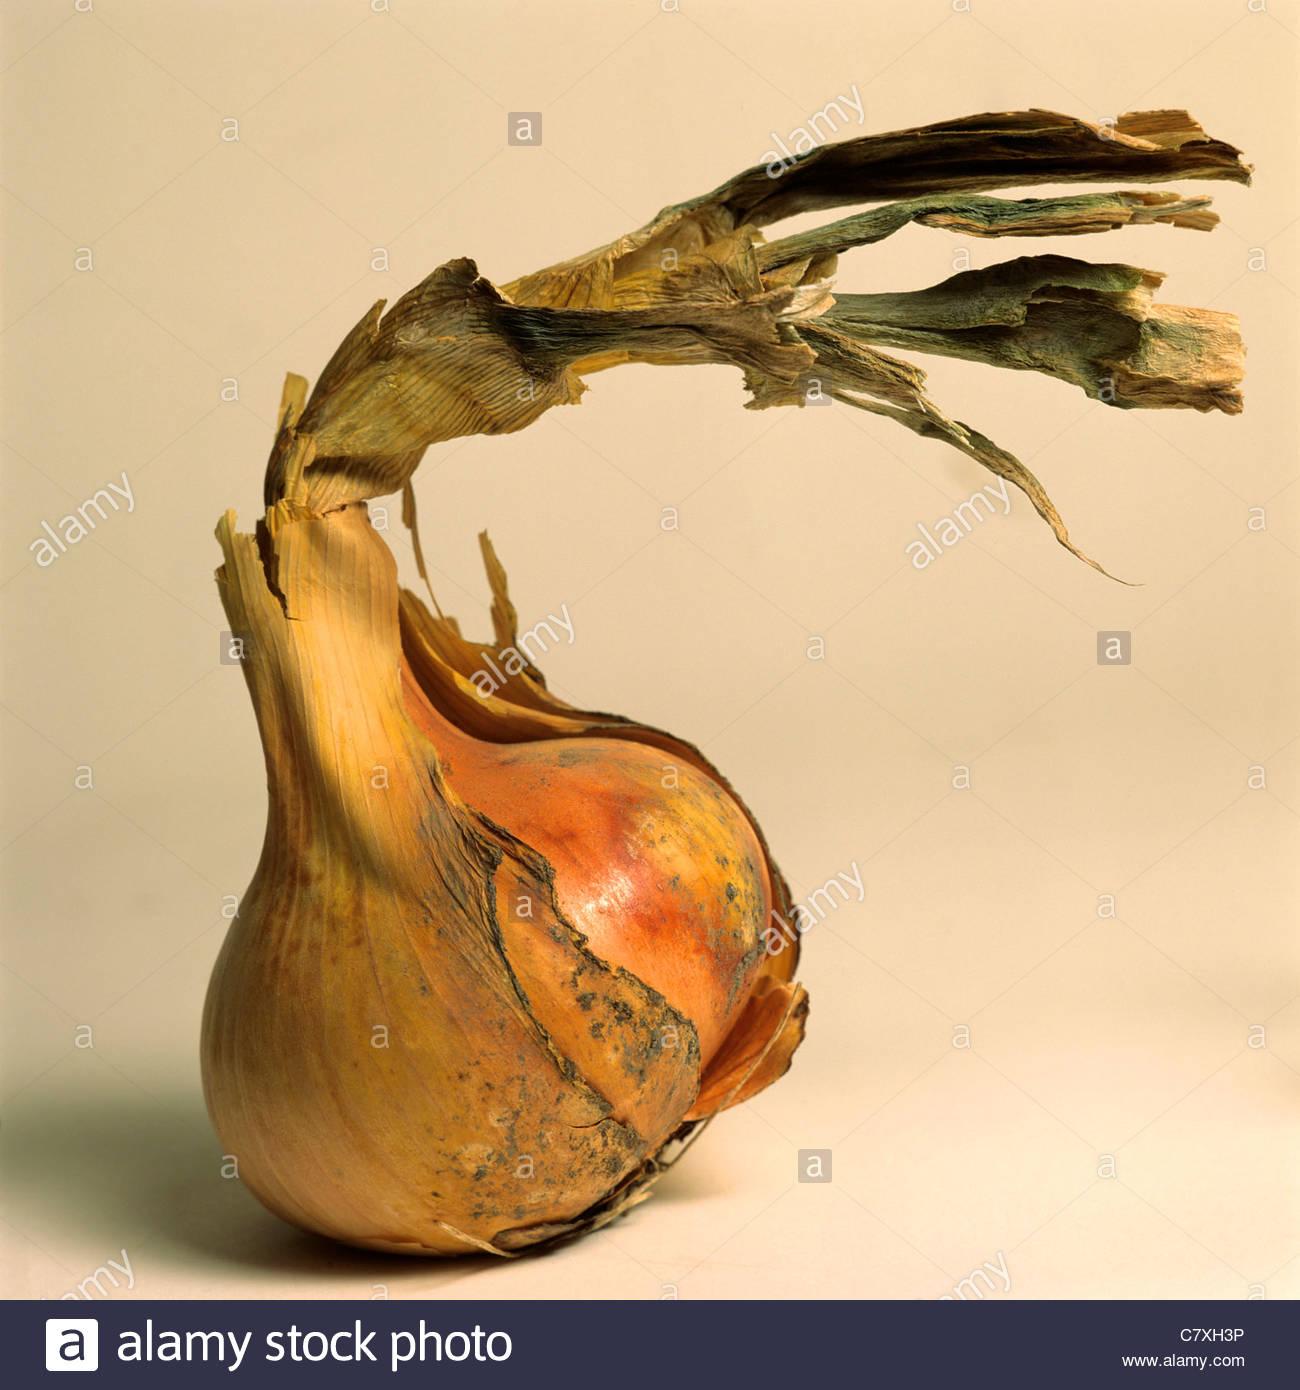 Onion con peeling pelle Immagini Stock